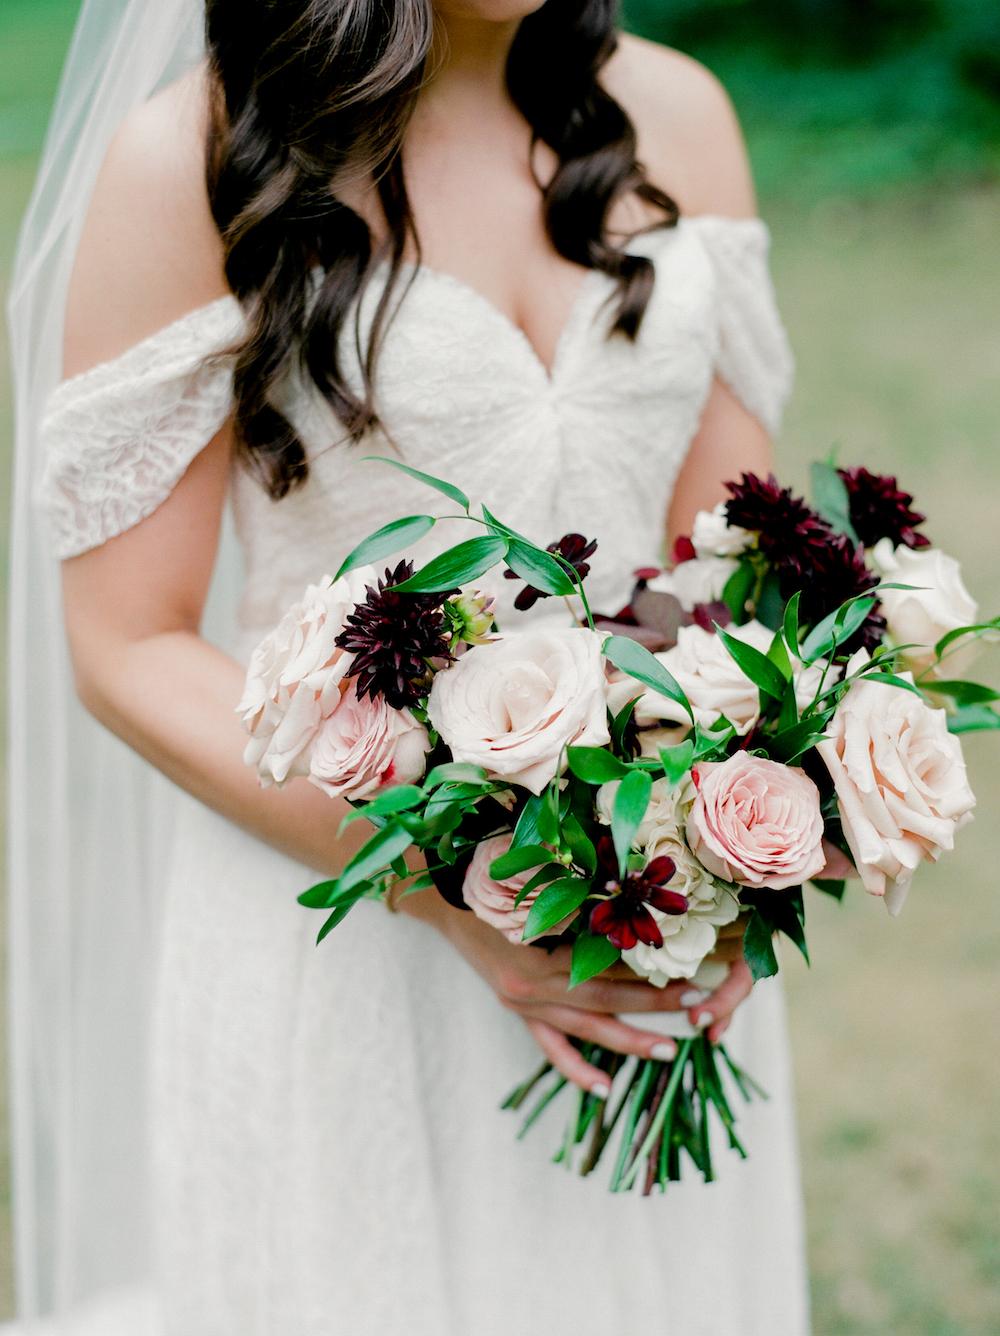 Blush Rose Bridal Bouquet - Wedding Florist Winnipeg